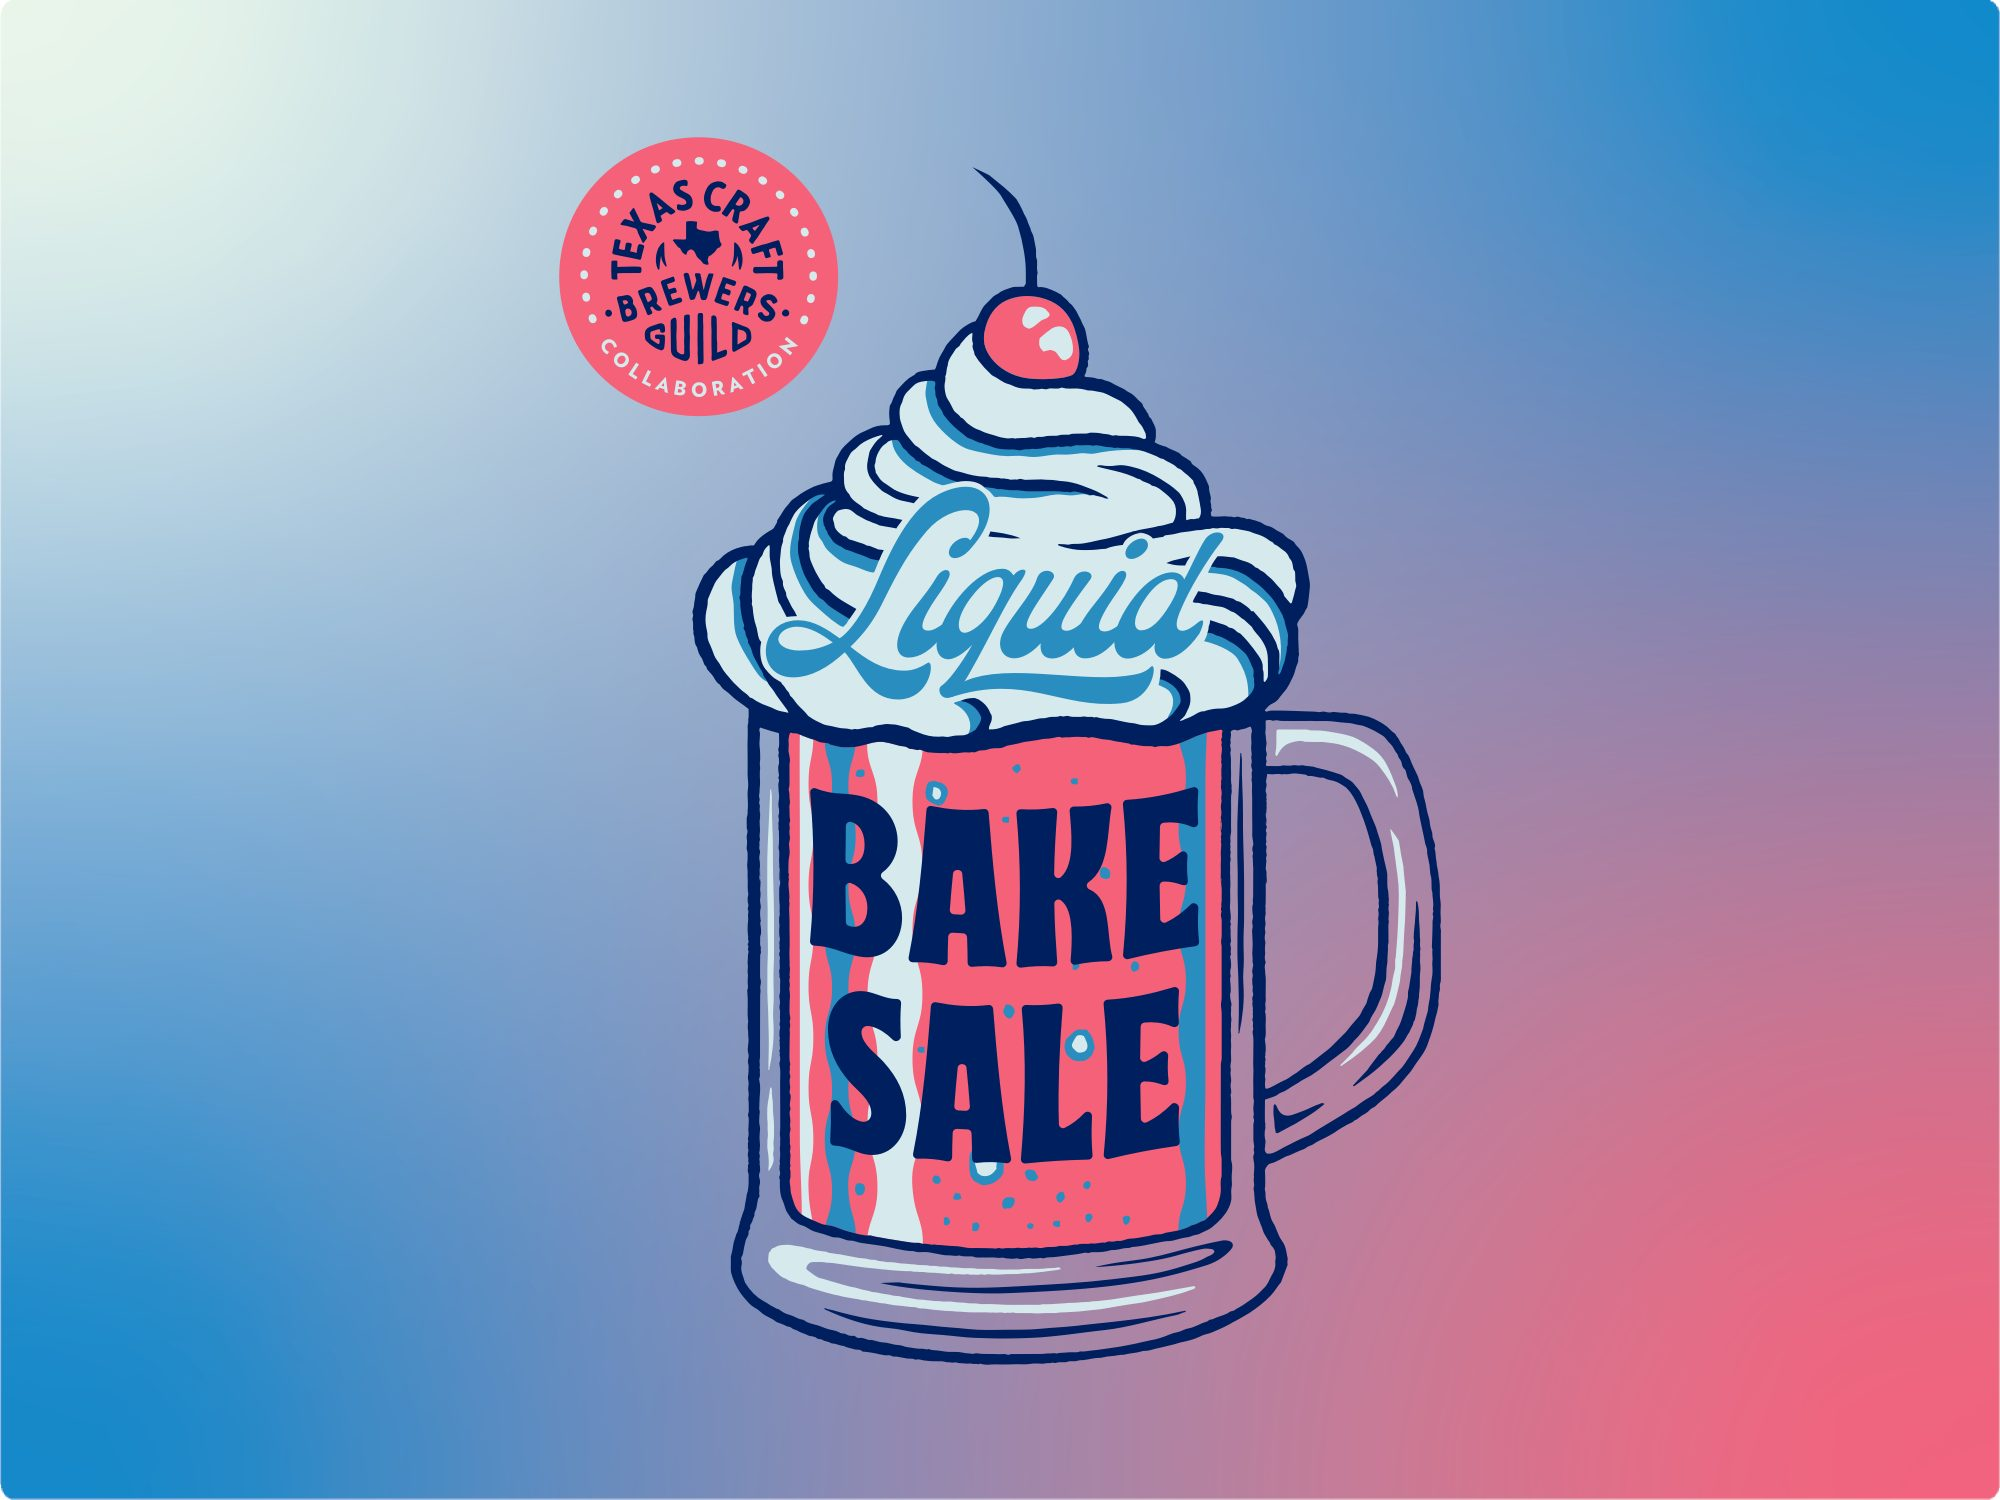 TCBG Liquid Bake Sale mug